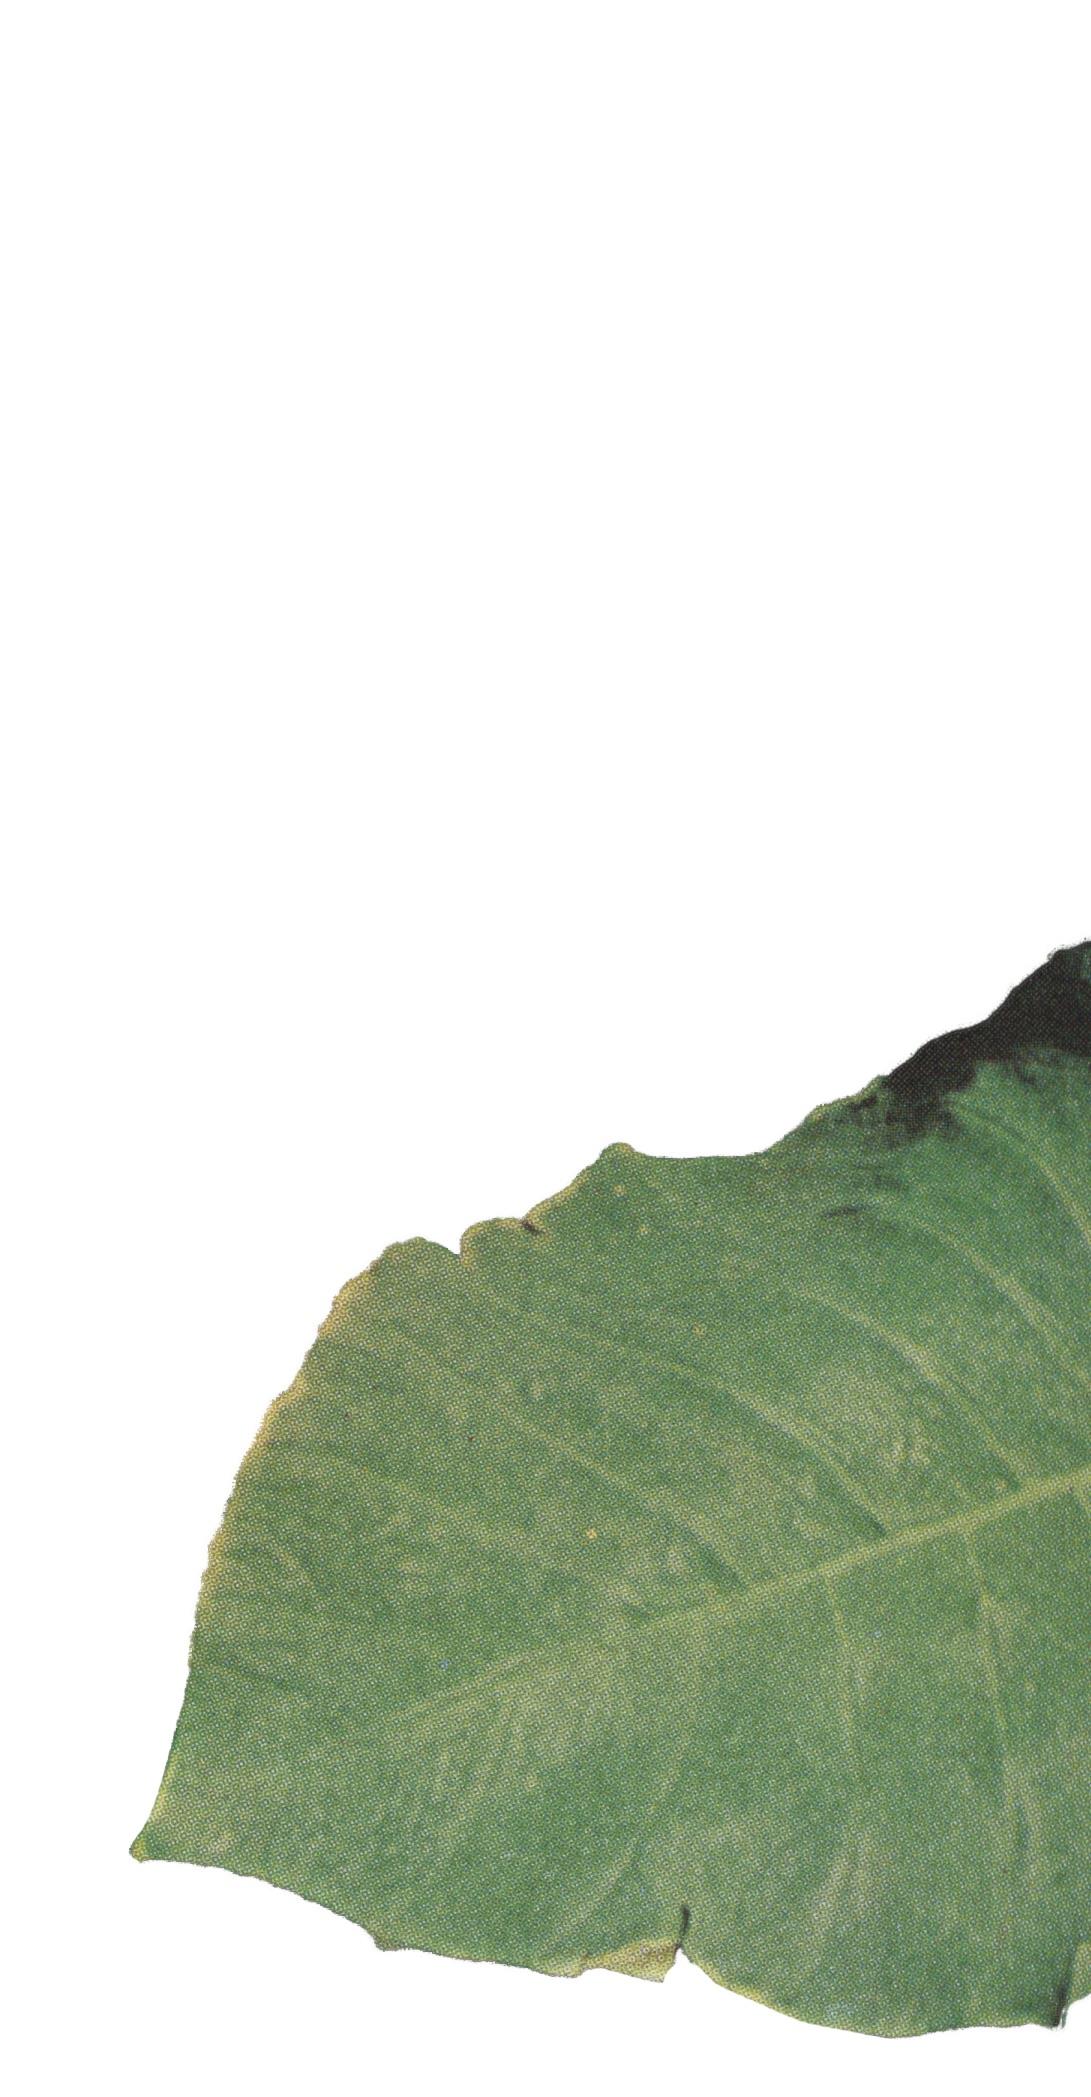 Leaf 6 (PNG)